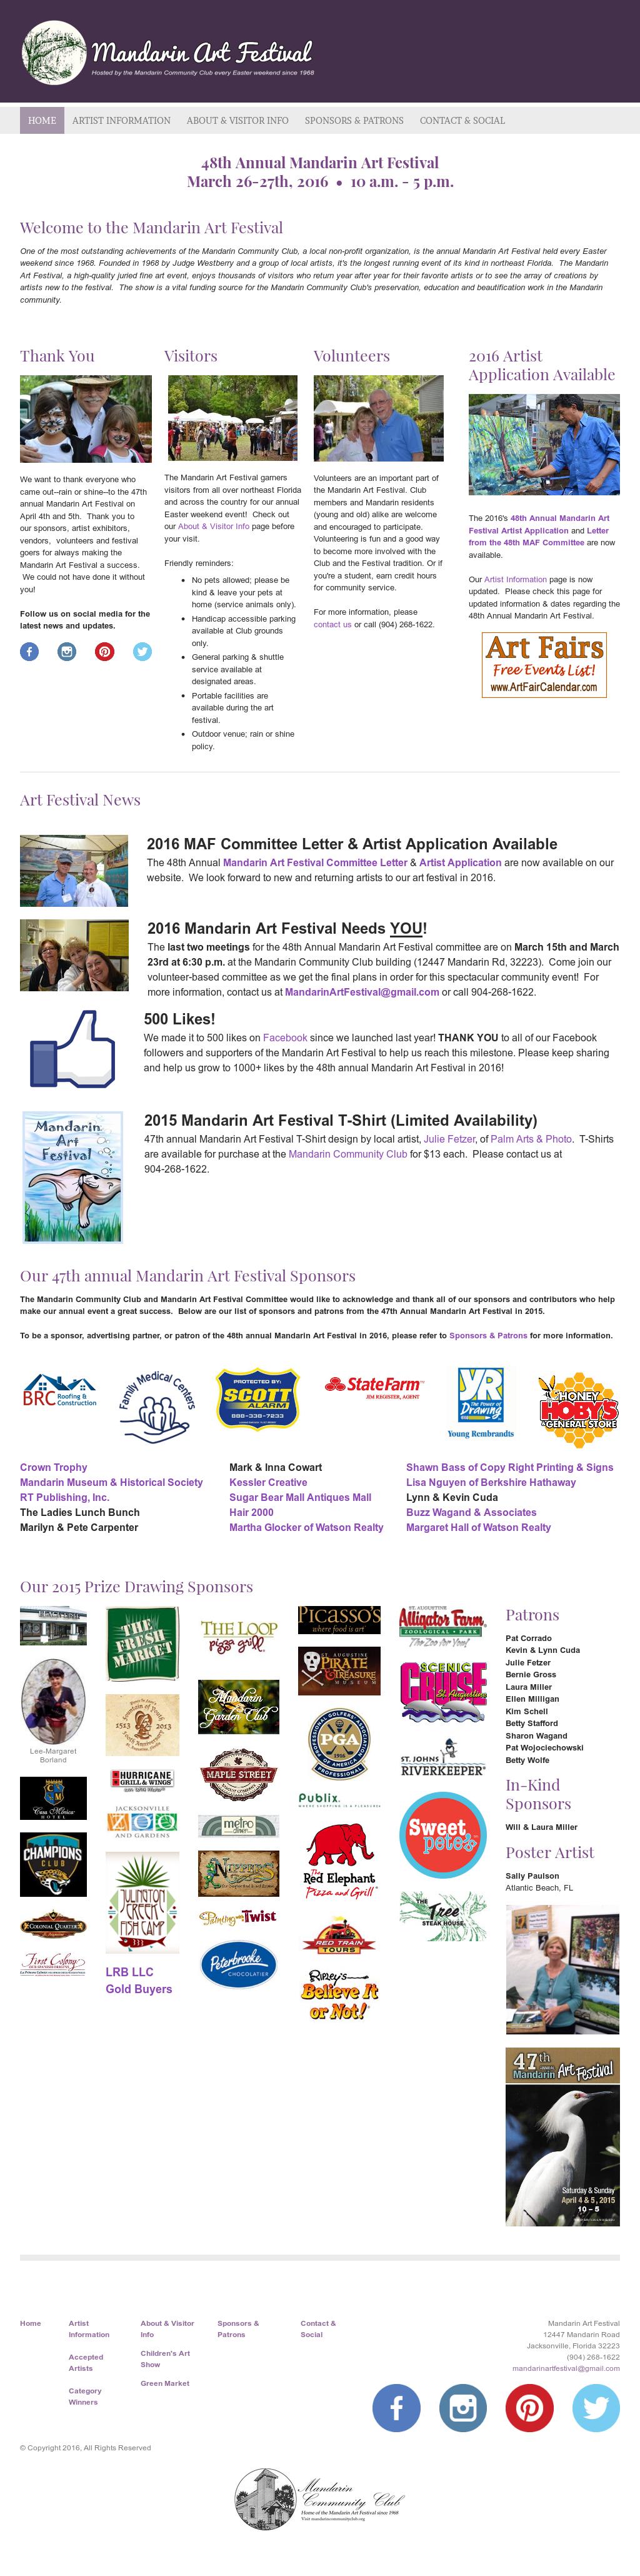 Mandarin Art Festival Competitors, Revenue and Employees